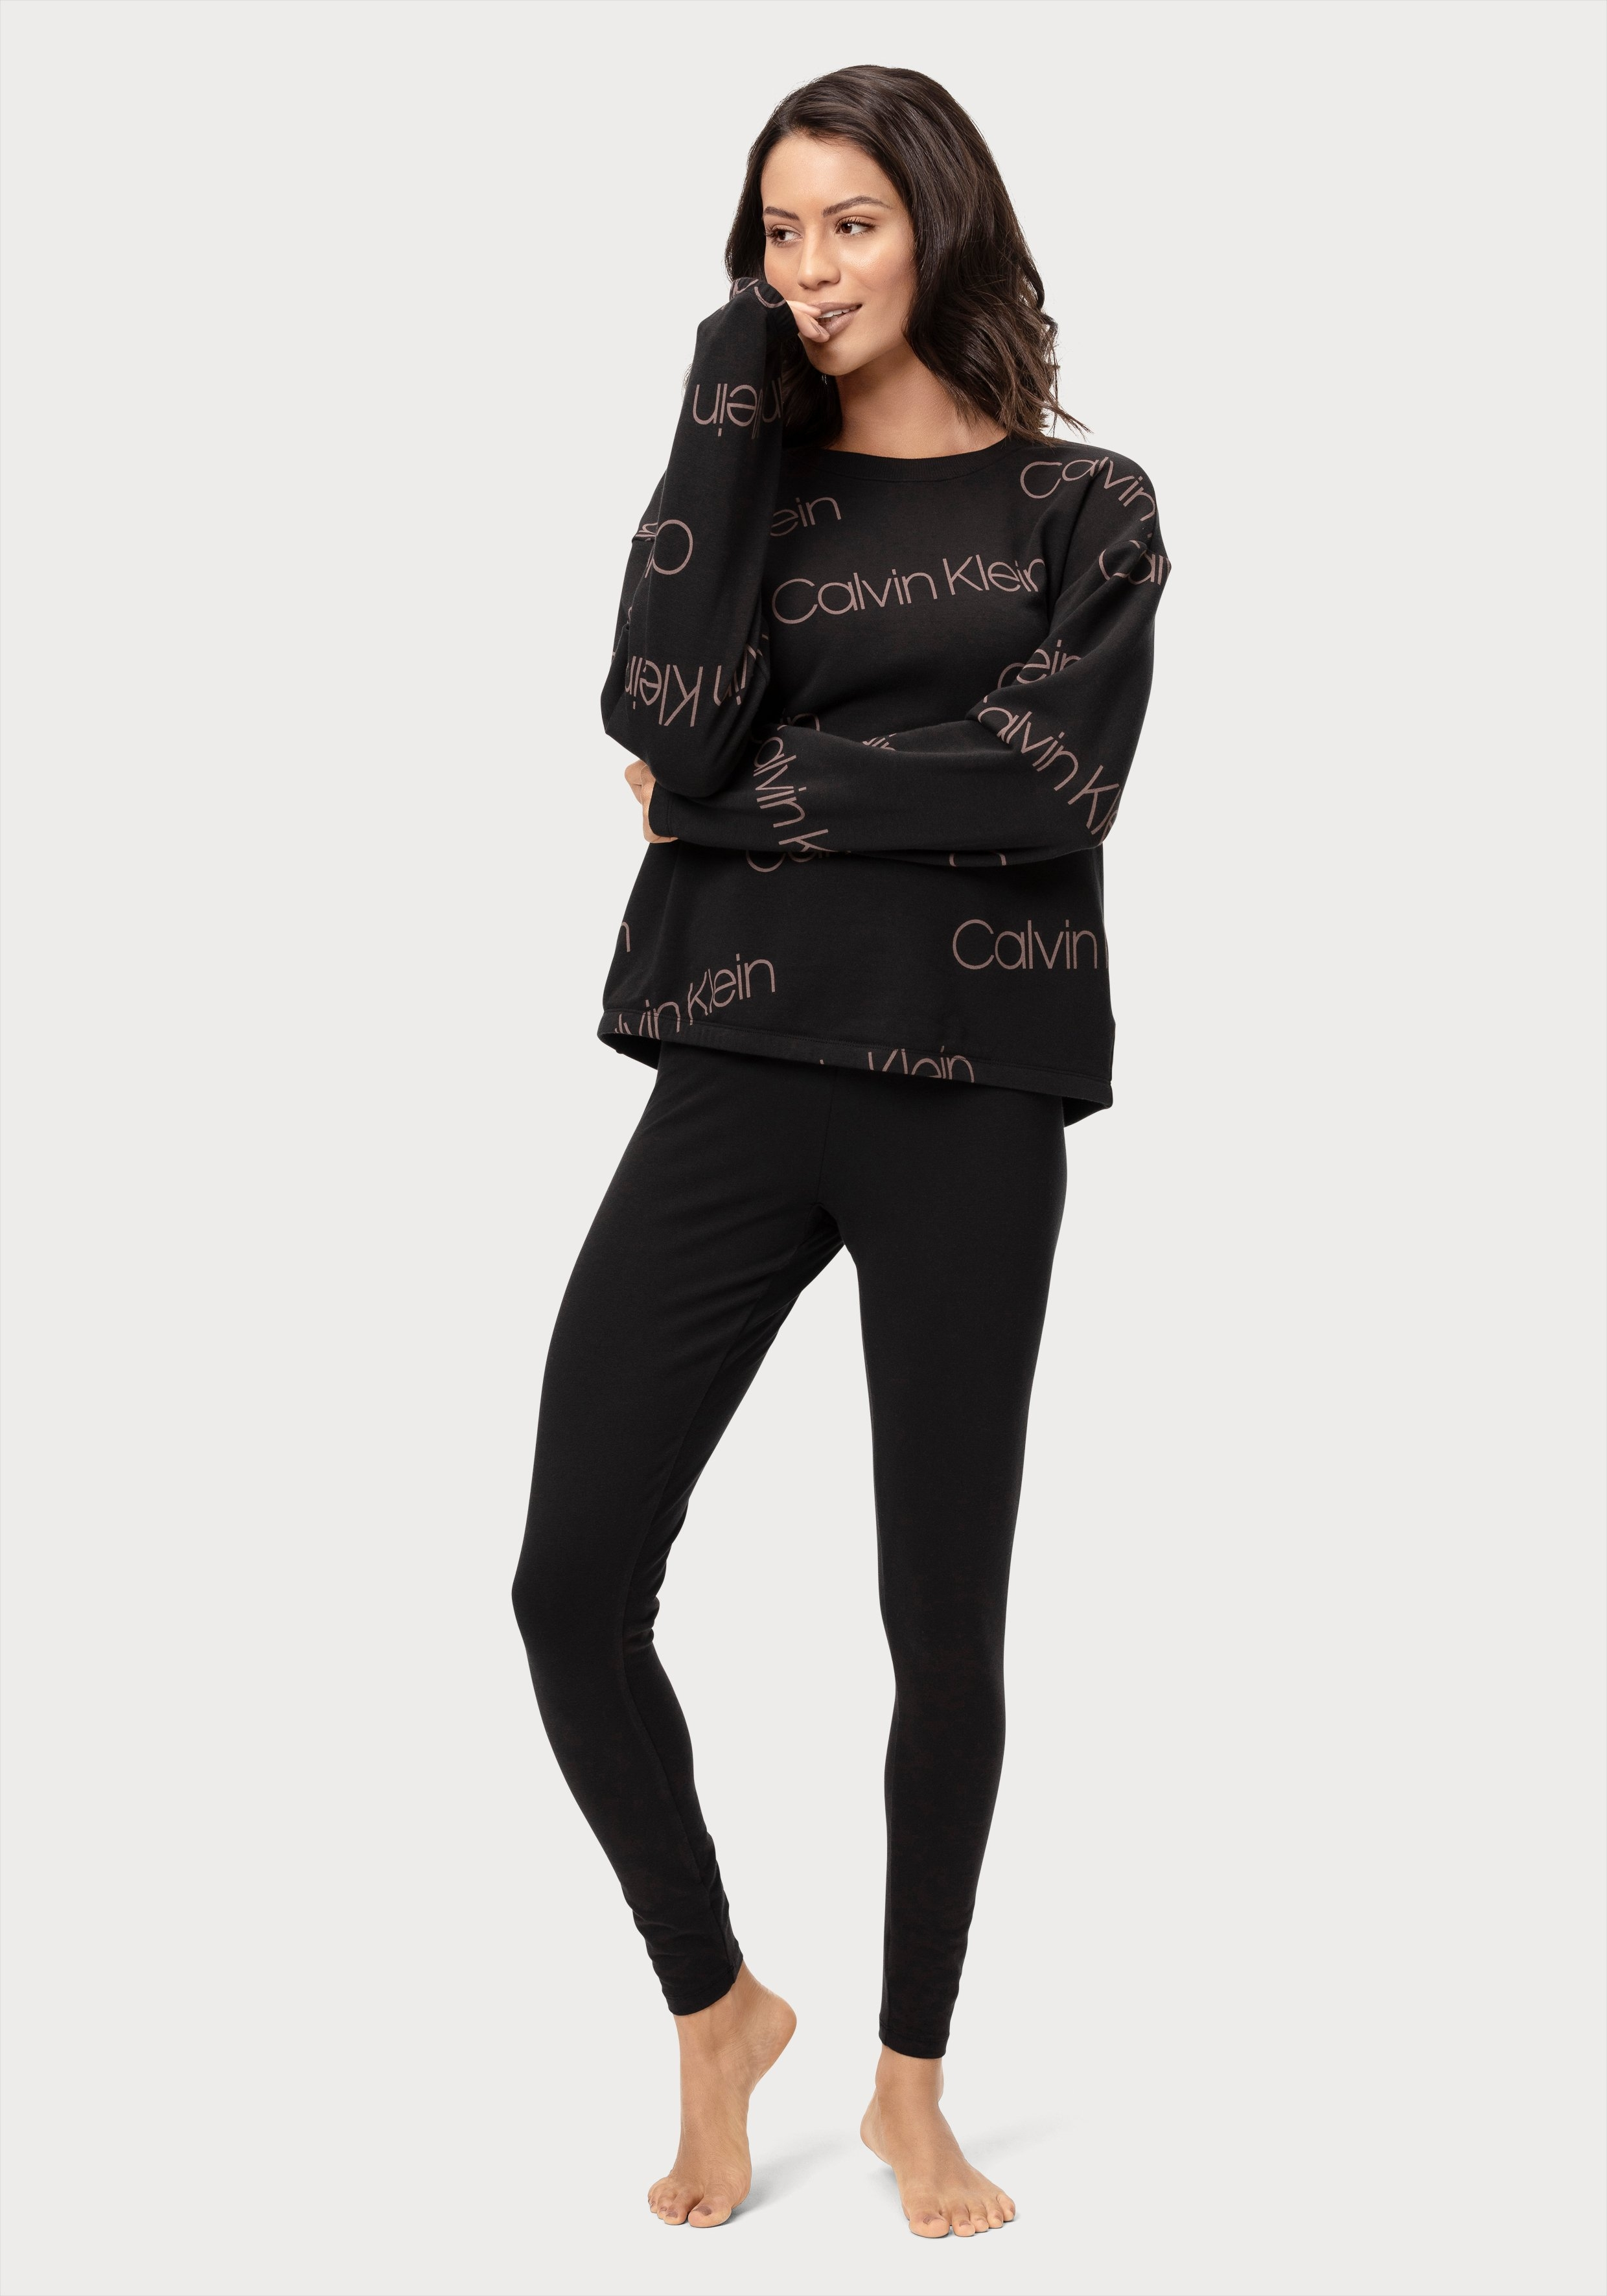 Calvin Klein legging bij Lascana online kopen